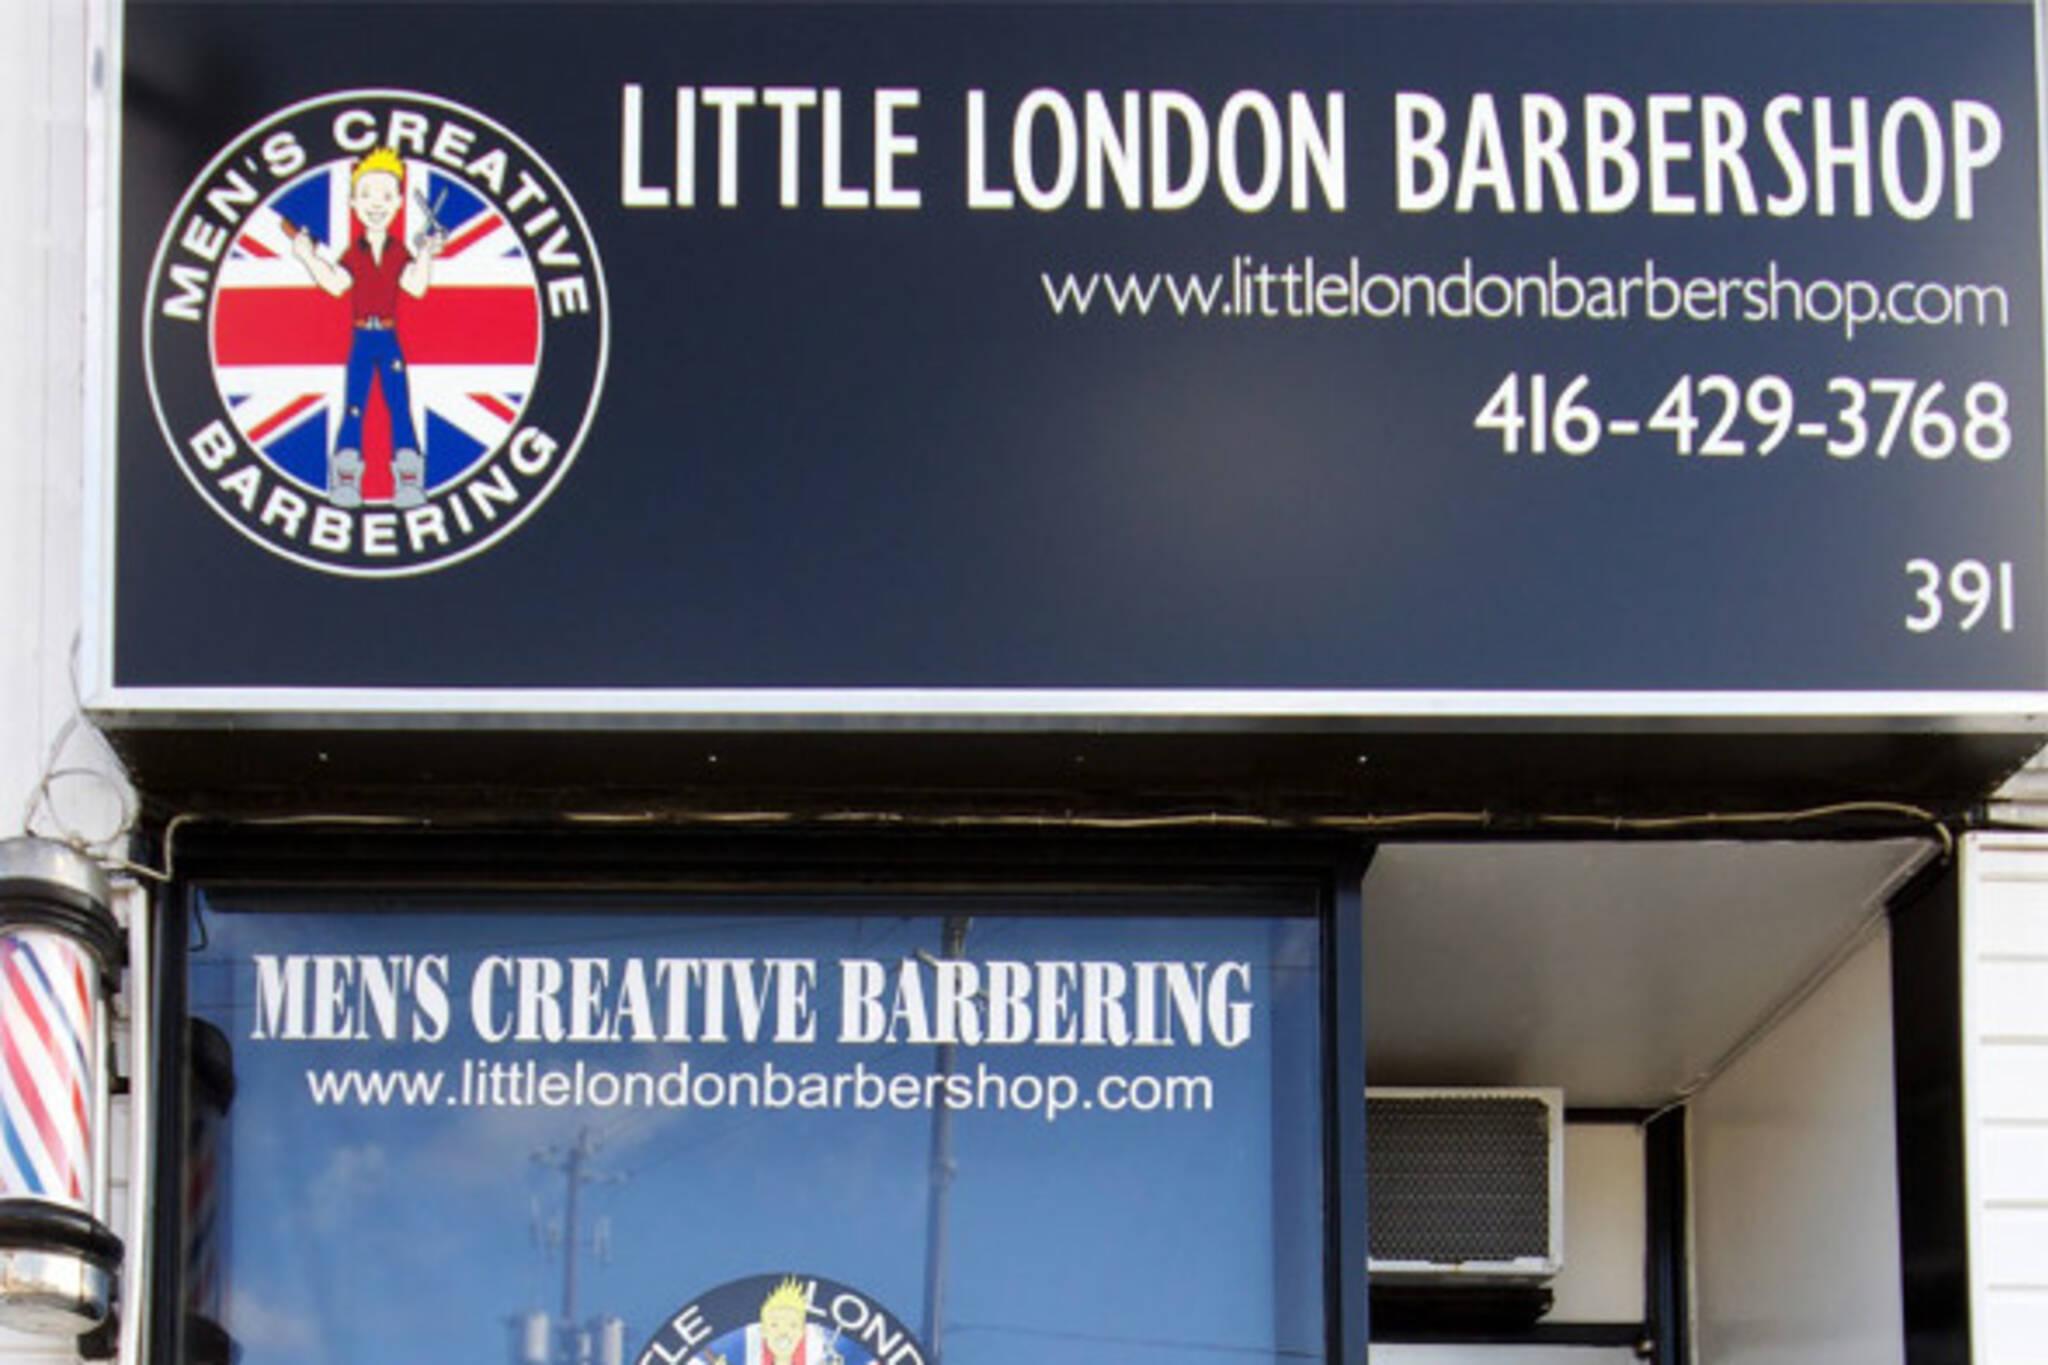 little london barber shop